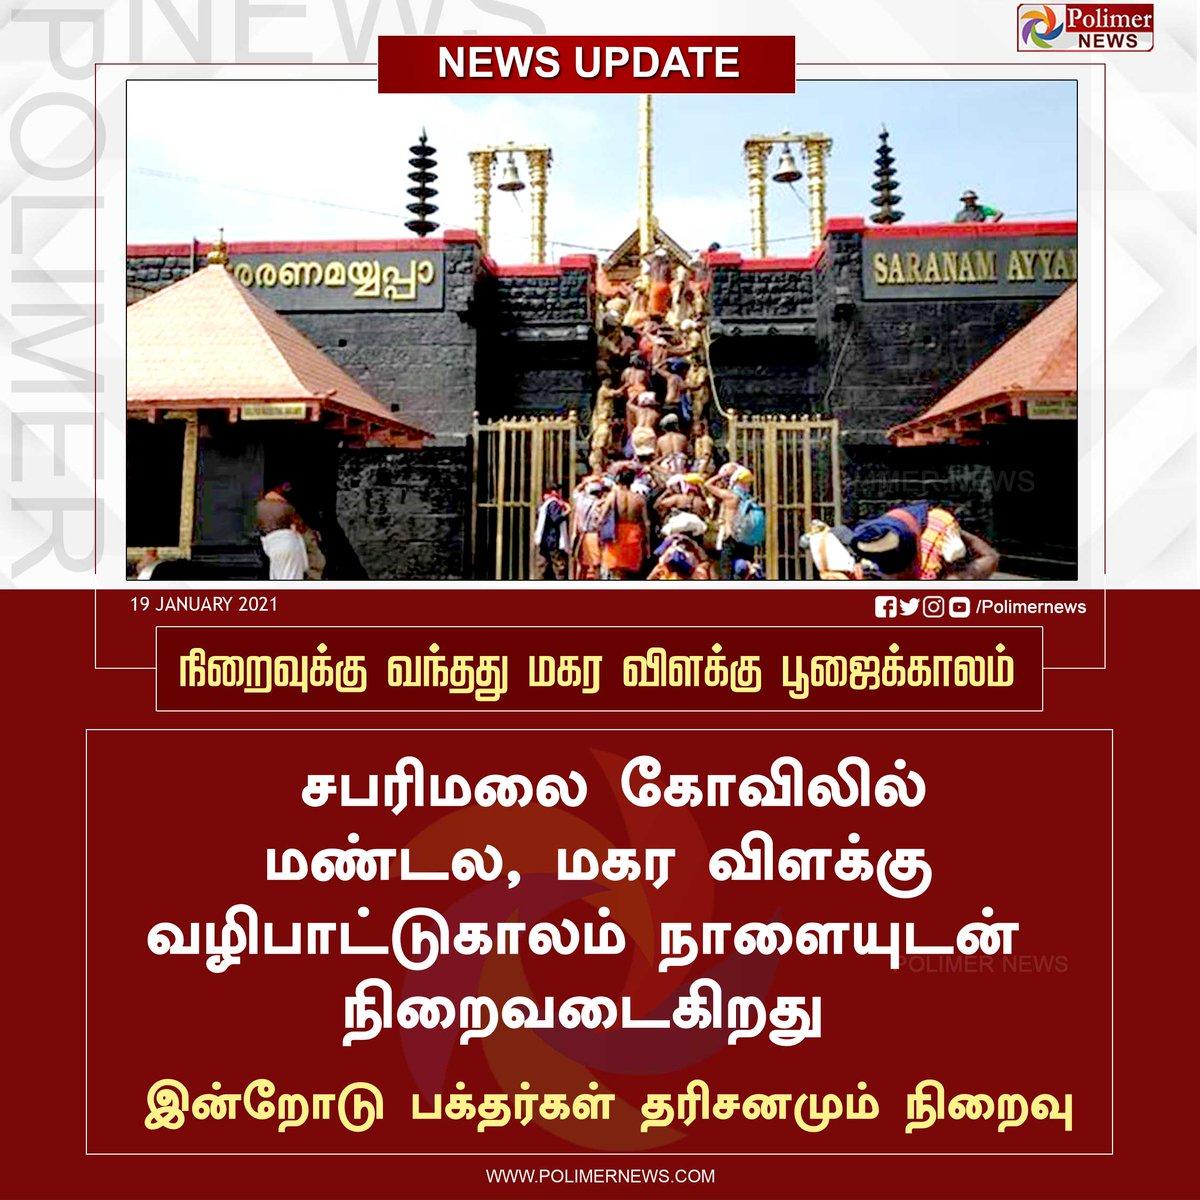 #NEWSUPDATE     சபரிமலையில் நிறைவுக்கு வந்தது மகரவிளக்கு பூஜைக்காலம் #Kerala   #Sabarimala   #SabarimalaTemple   #Makaravilakku  